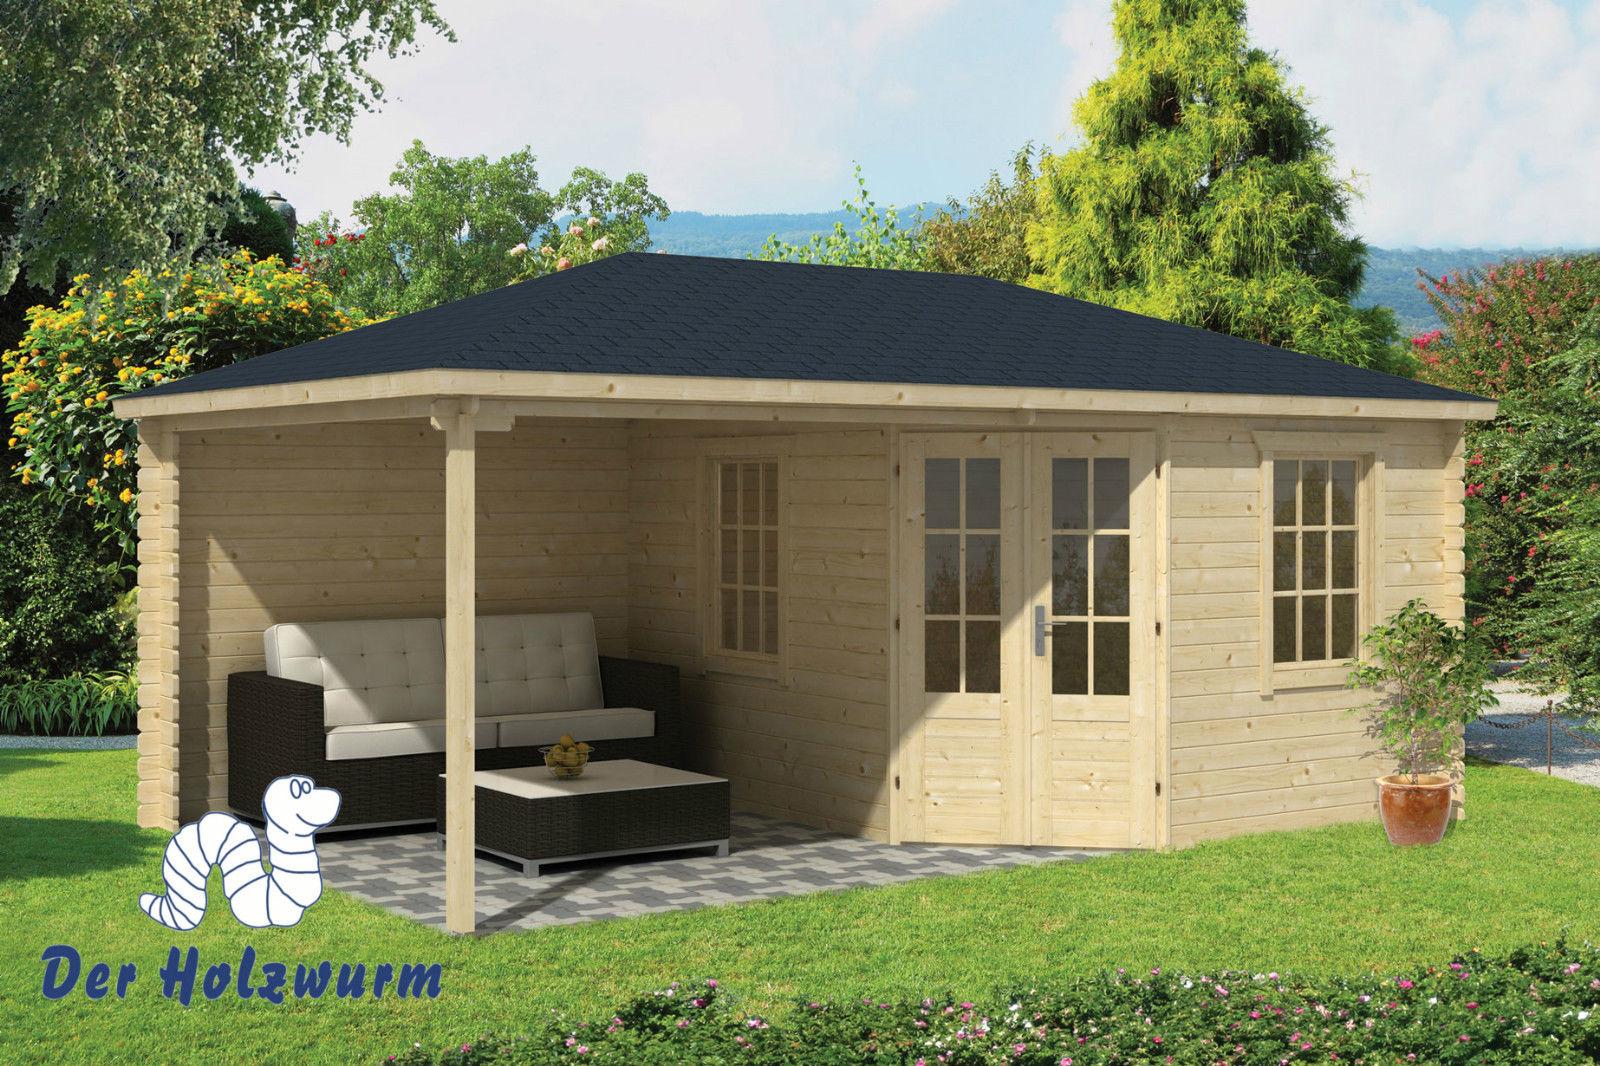 gartenhaus christoffer 28 mm ca 575x350 cm holzwurm obersayn. Black Bedroom Furniture Sets. Home Design Ideas